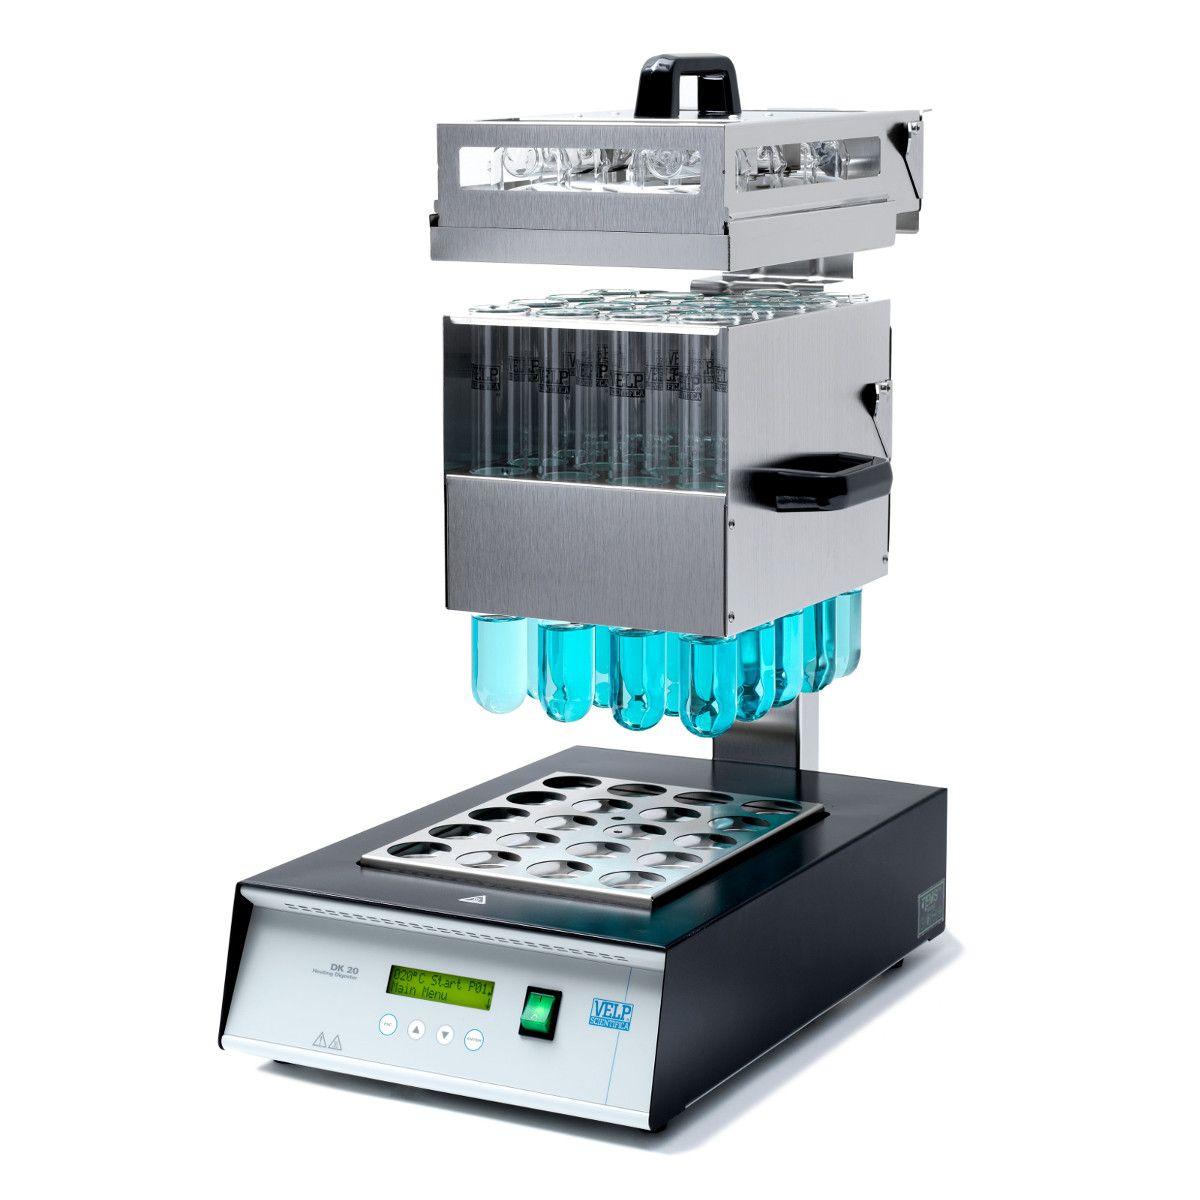 VELP Scientifica - DK Series Semi automatic Kjeldahl Digestion Units